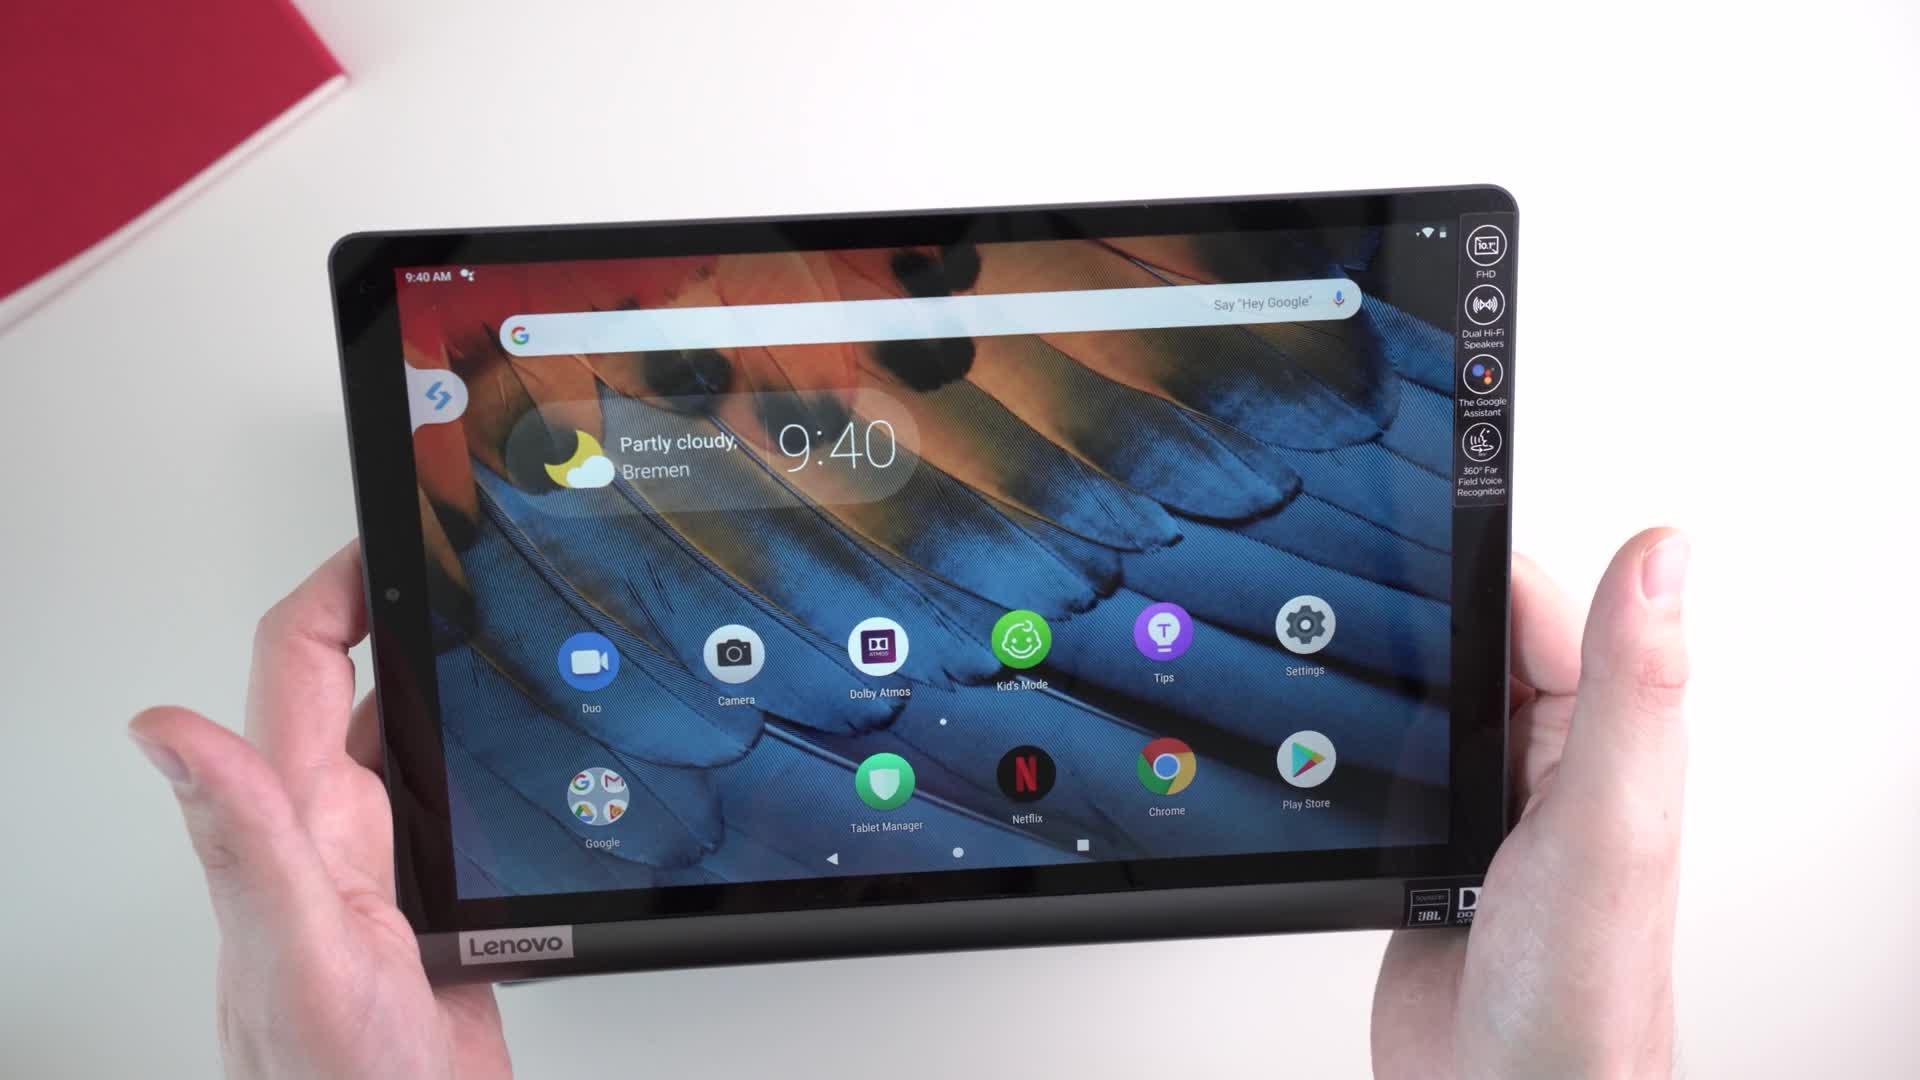 Android, Tablet, Lenovo, Andrzej Tokarski, Tabletblog, Unboxing, Lenovo Yoga, Android 9, Smart Tab, Lenovo Yoga Smart Tab, Lenovo Yoga Smart